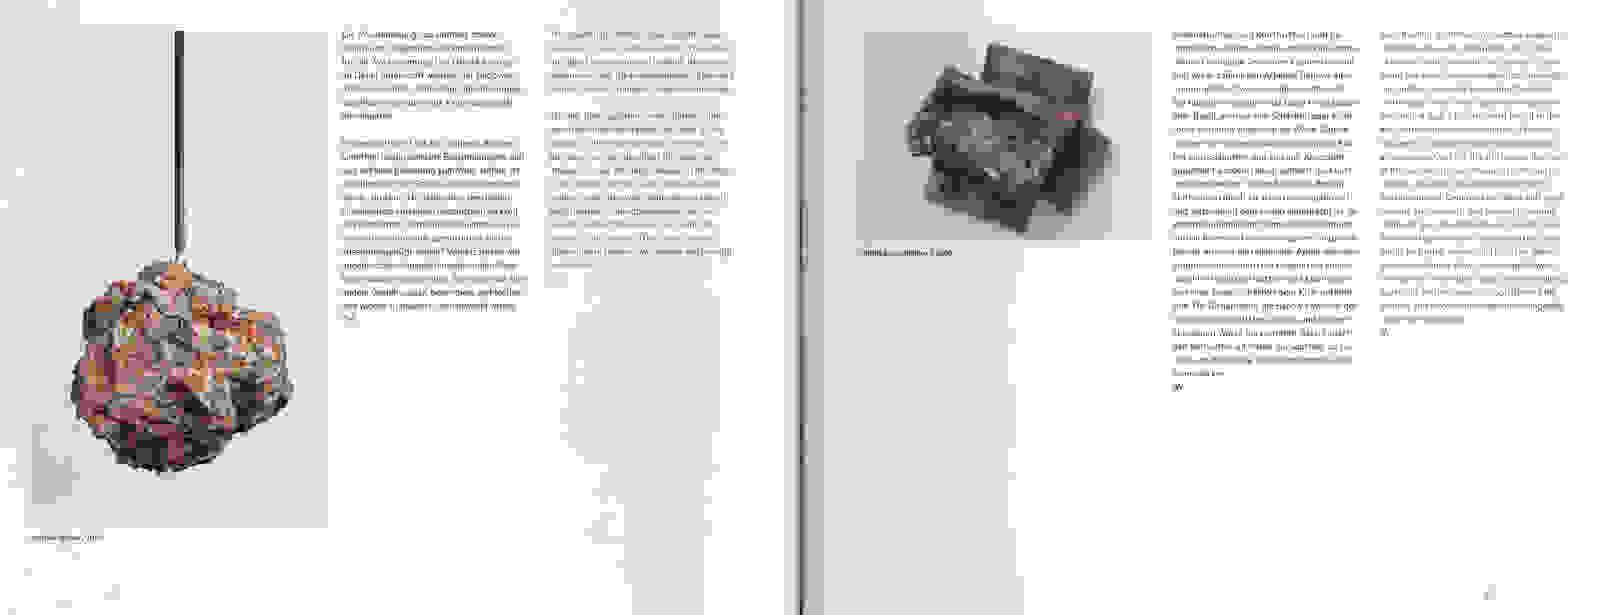 Phyllida Barlow DS 1600x615 12